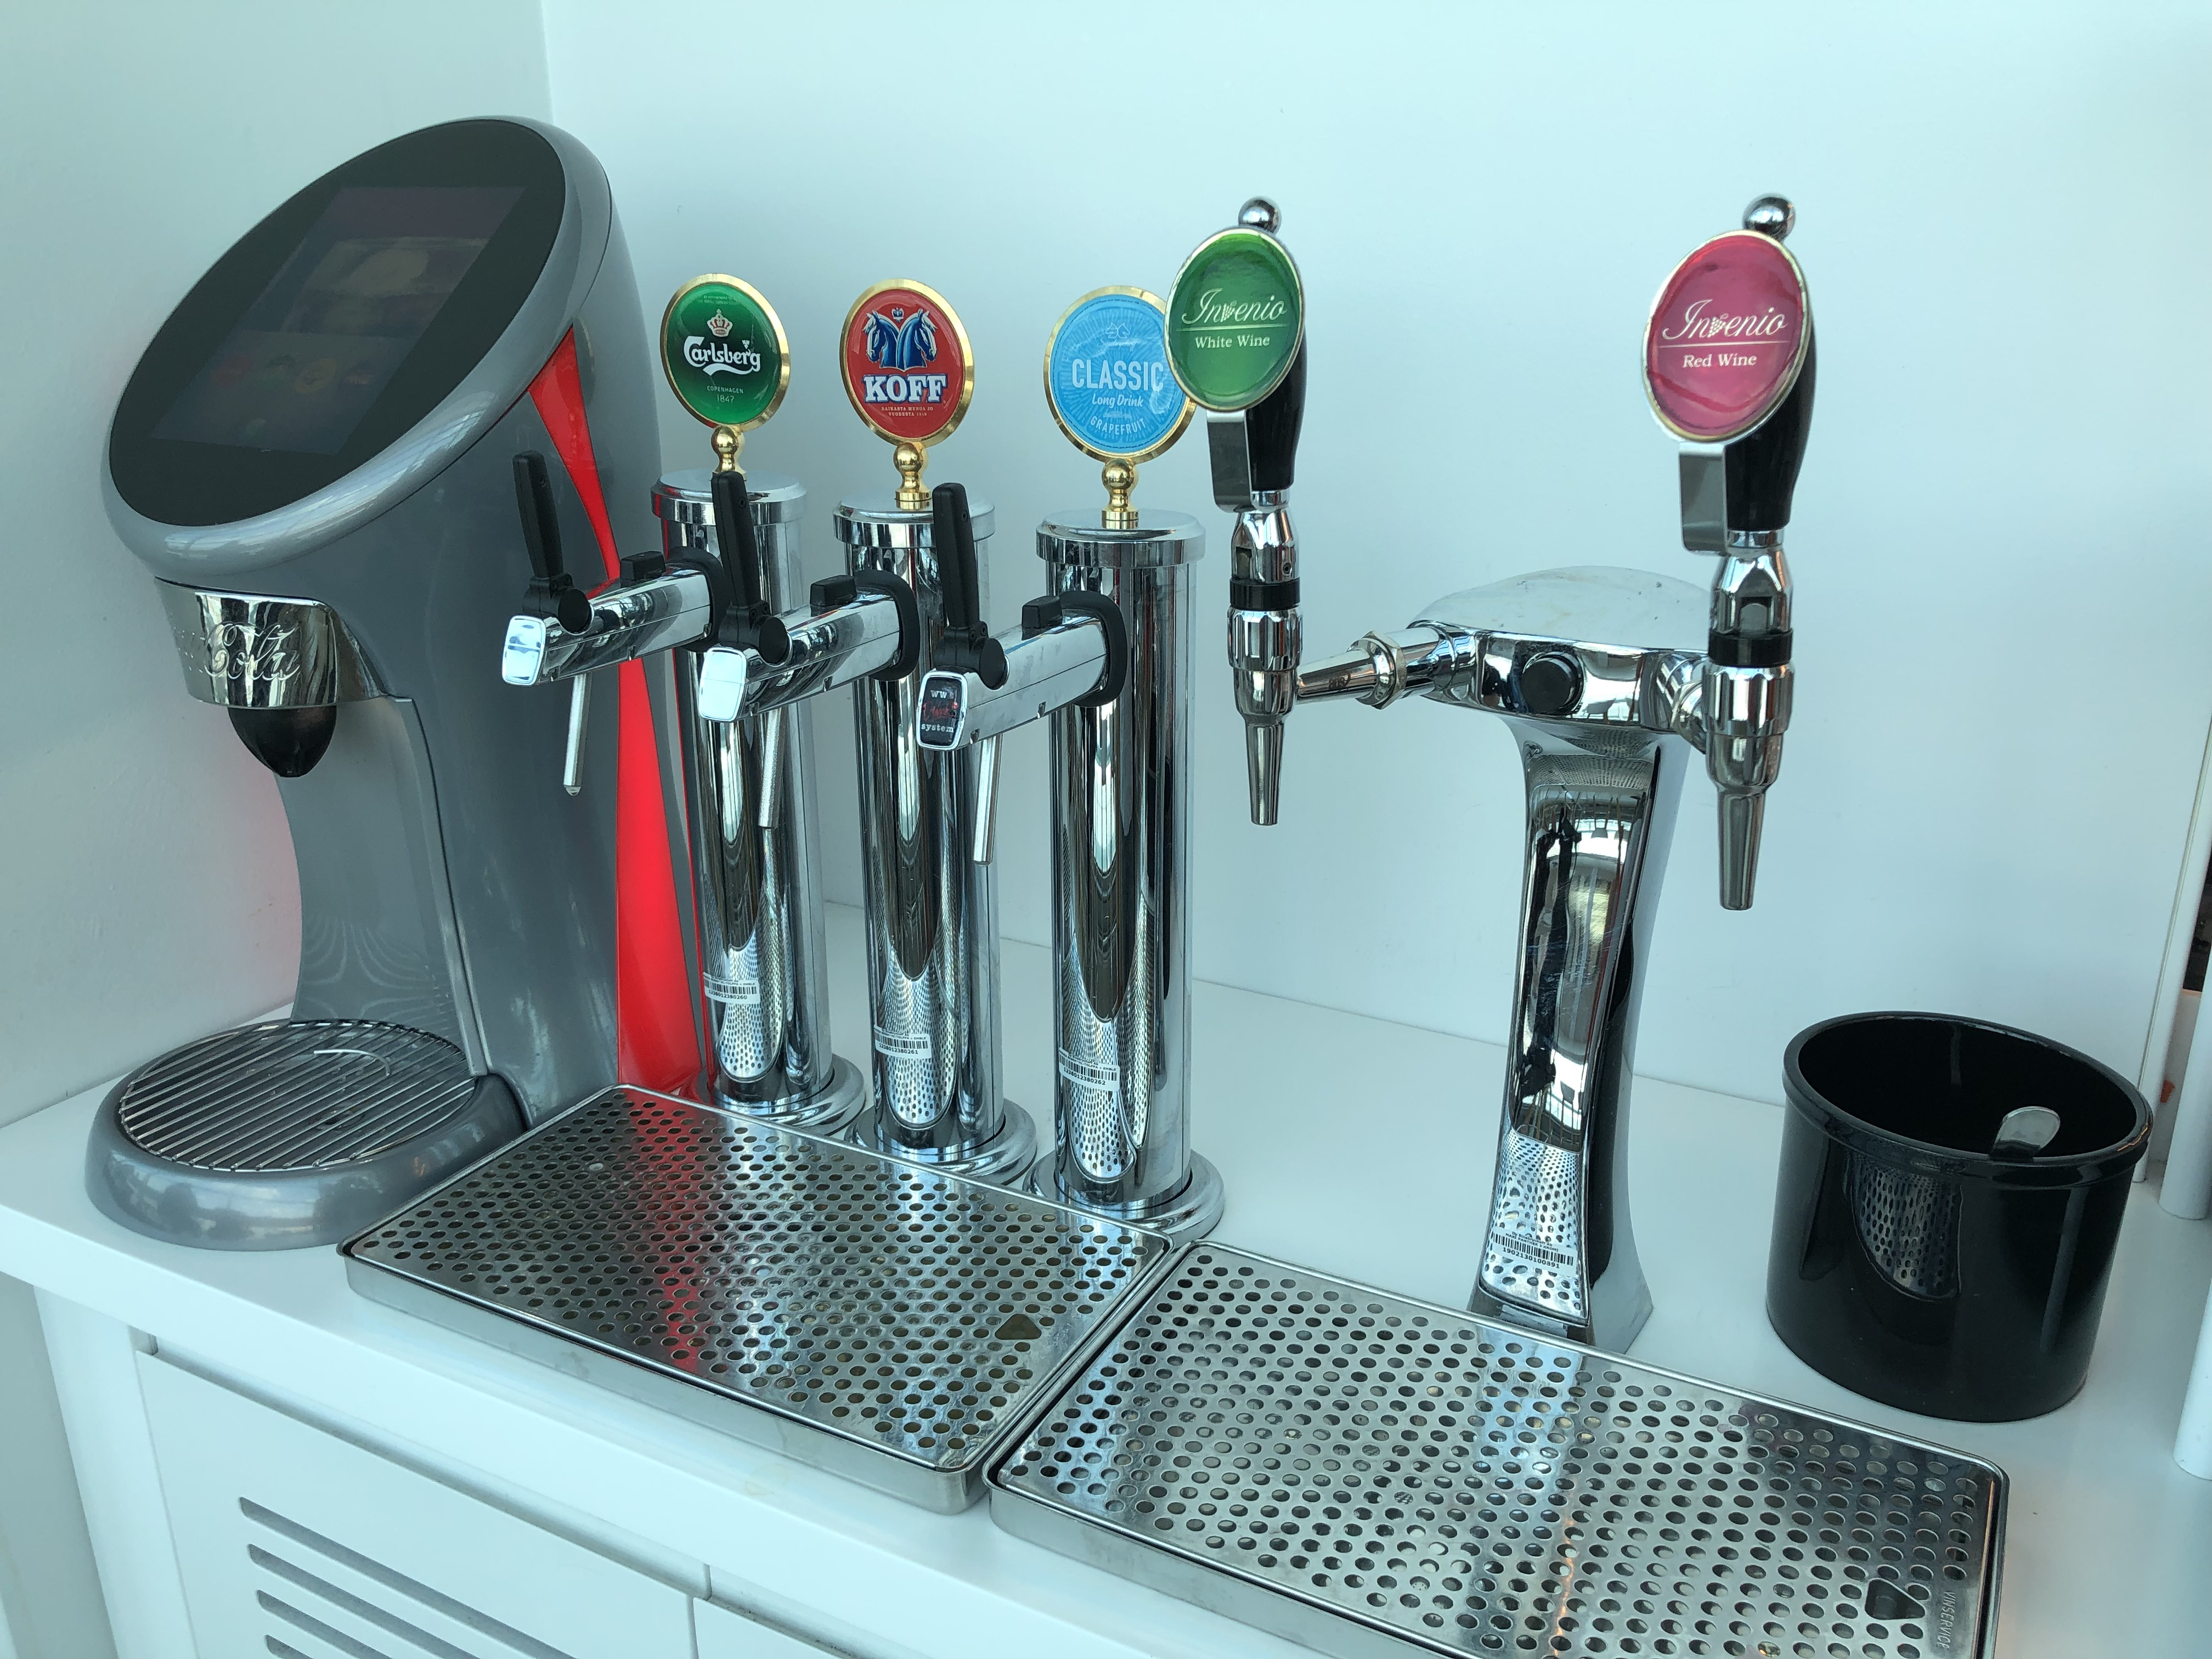 Finnair Business Class Lounge Helsinki draft beer and wine